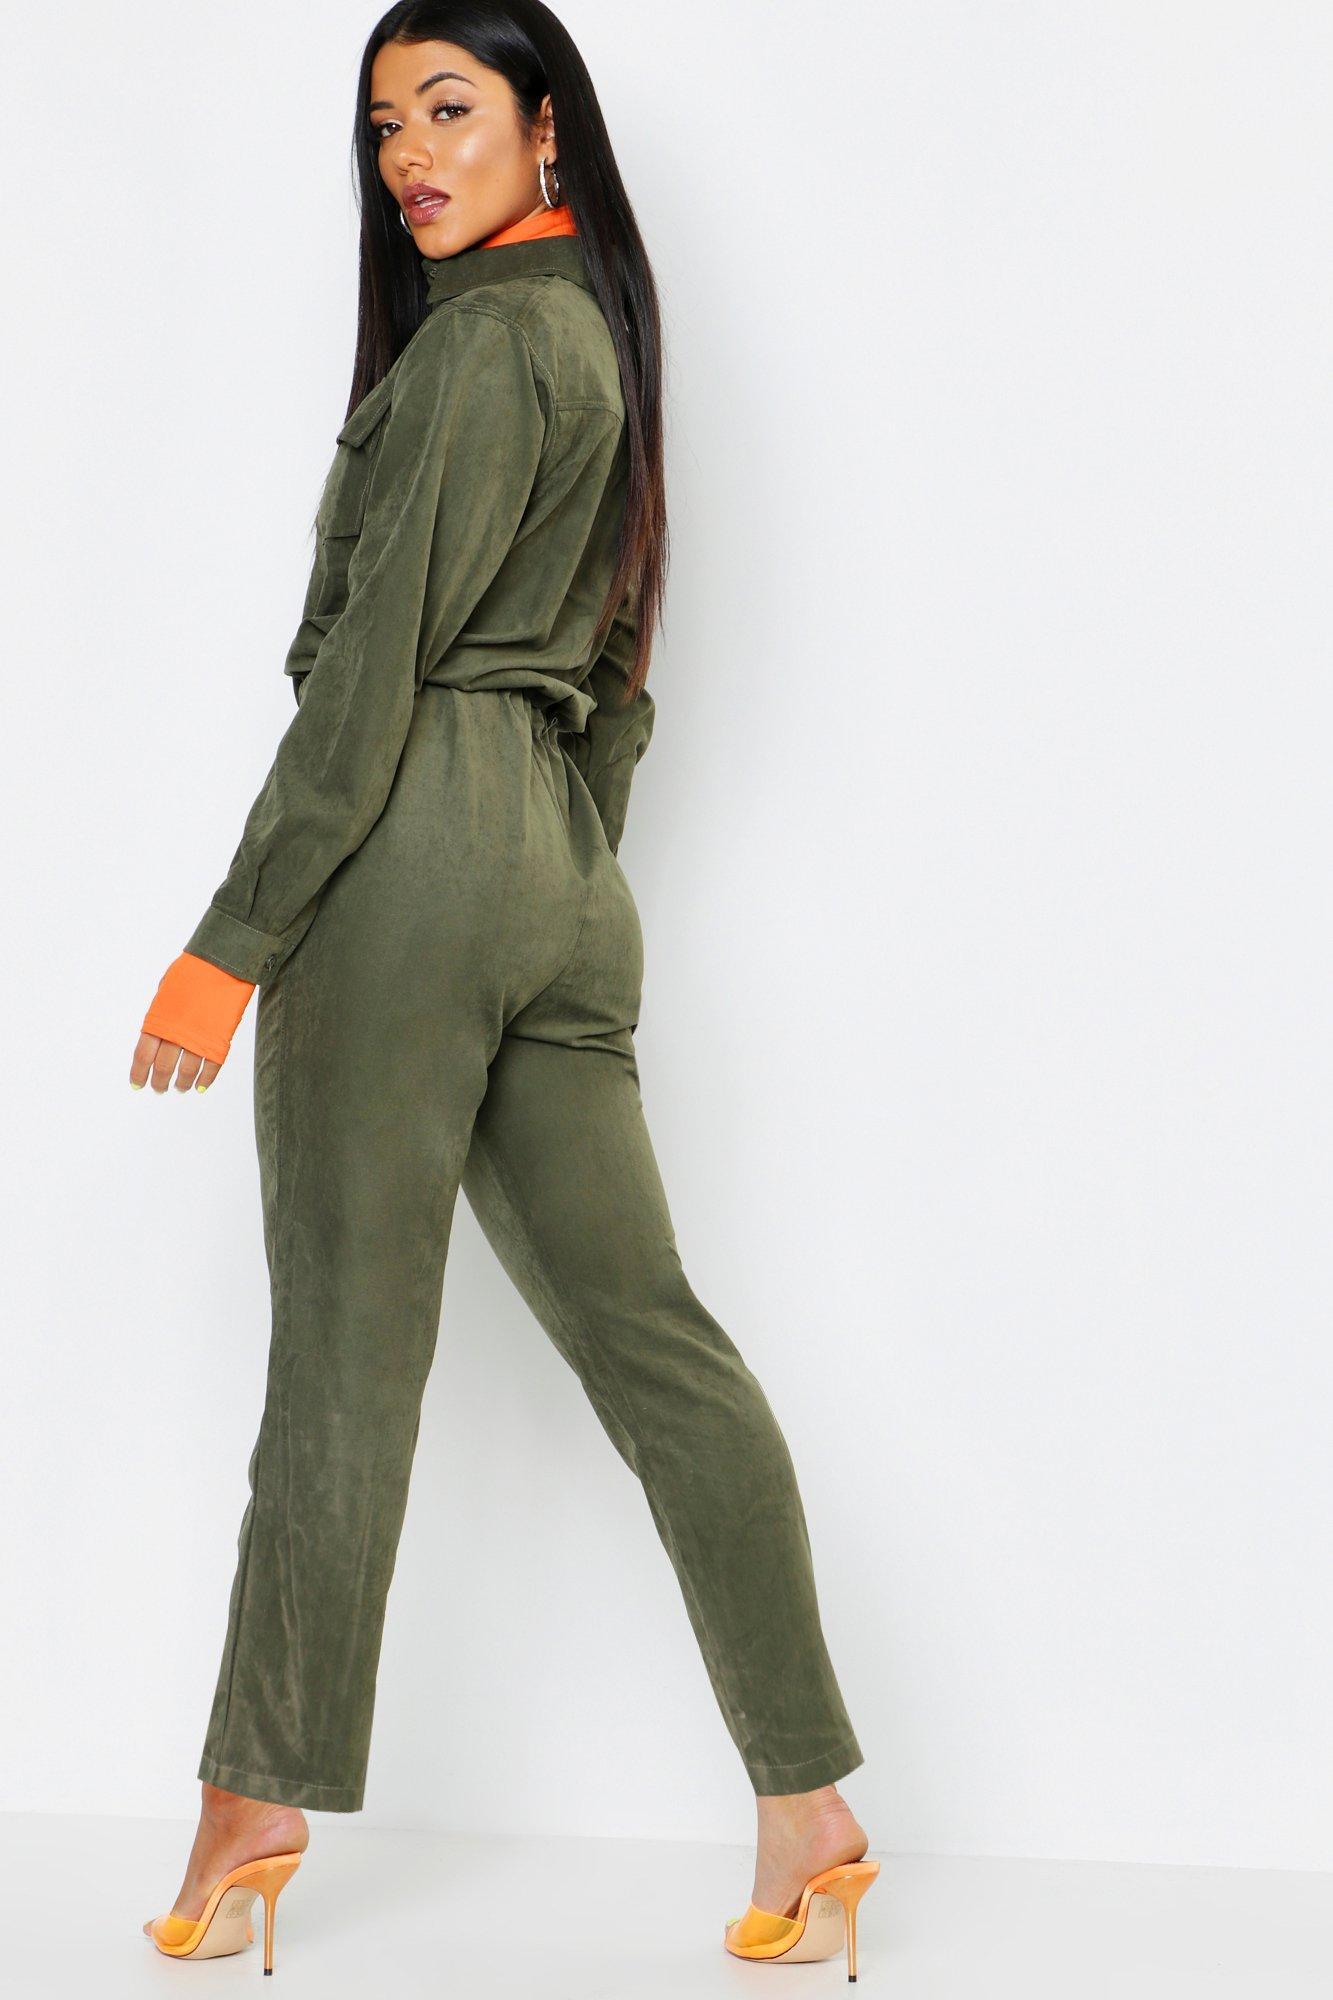 Boohoo | Практичный комбинезон с брюками-карго из ткани под замшу | Clouty